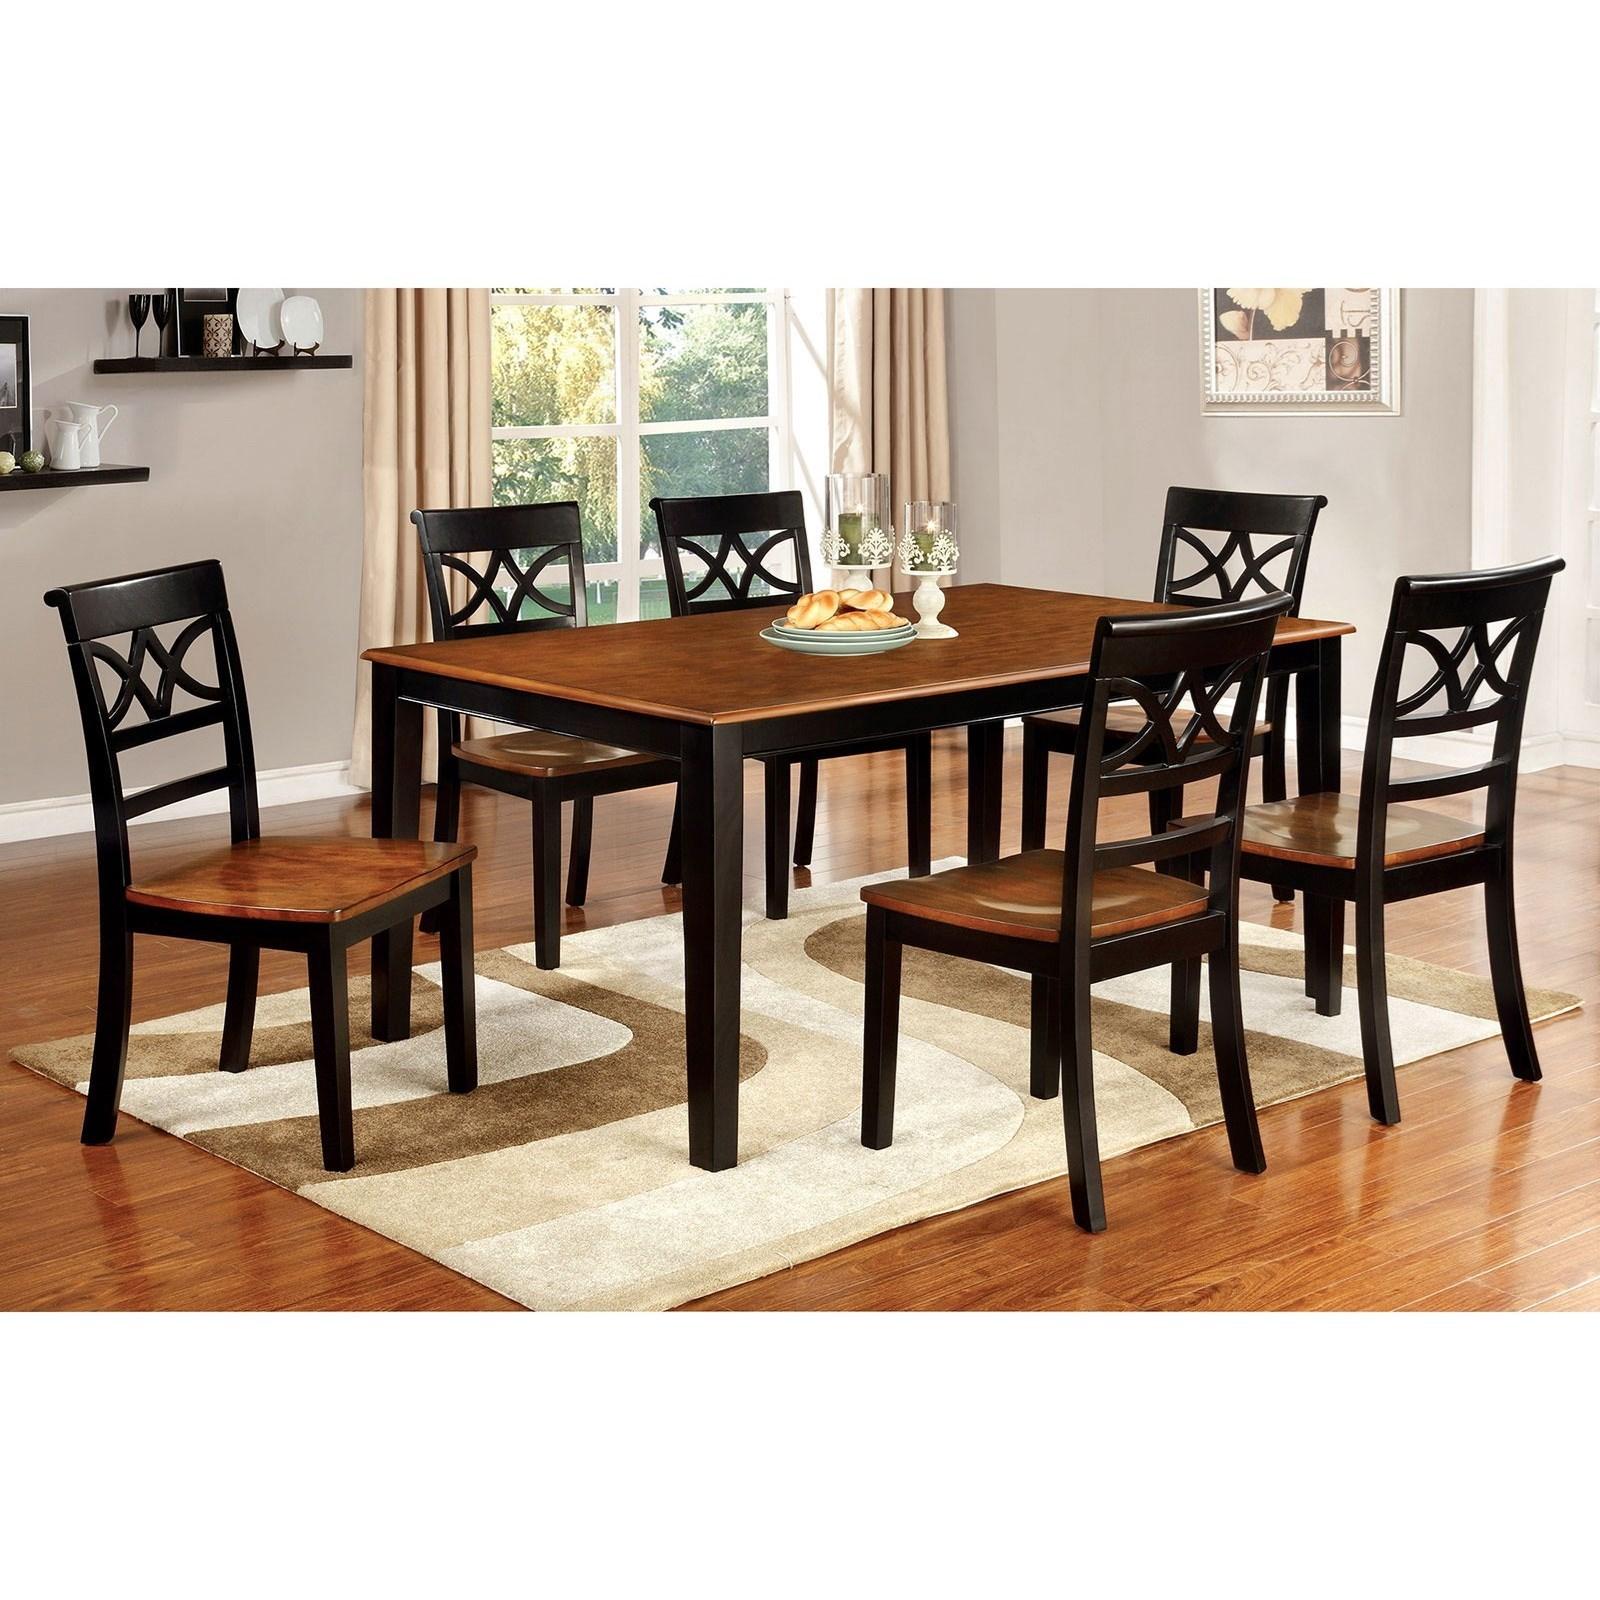 Torrington Dining Table Set at Household Furniture